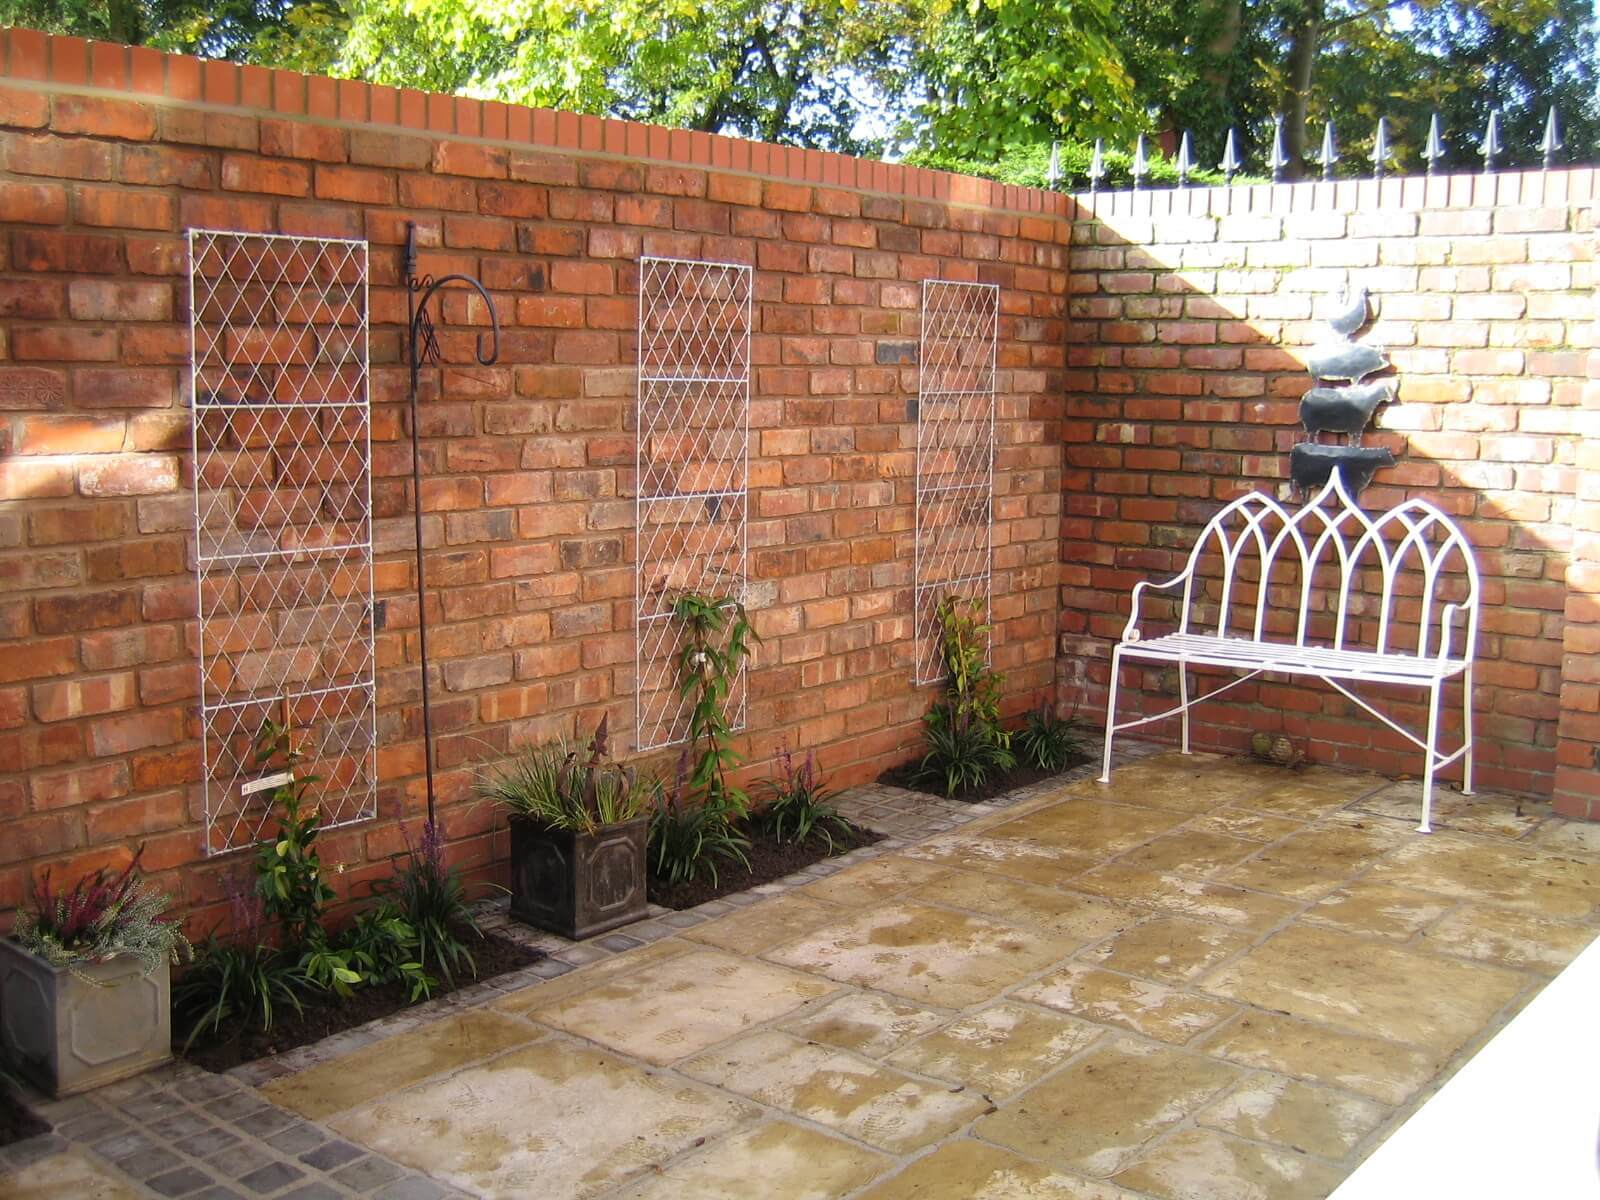 garden walls garden wall for a small garden with light bricks QURGXDM